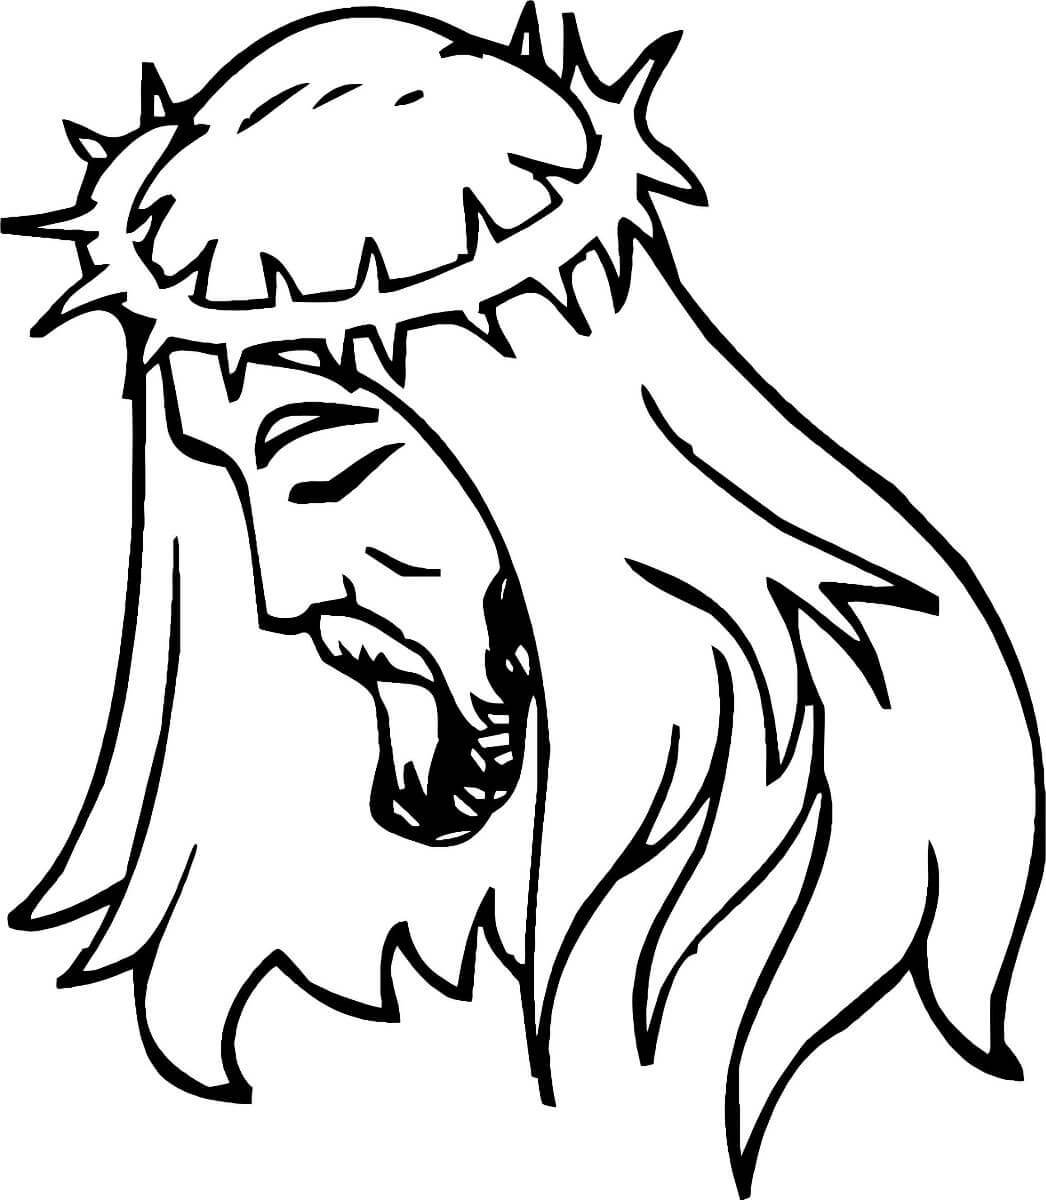 Imagens De Jesus Para Baixar